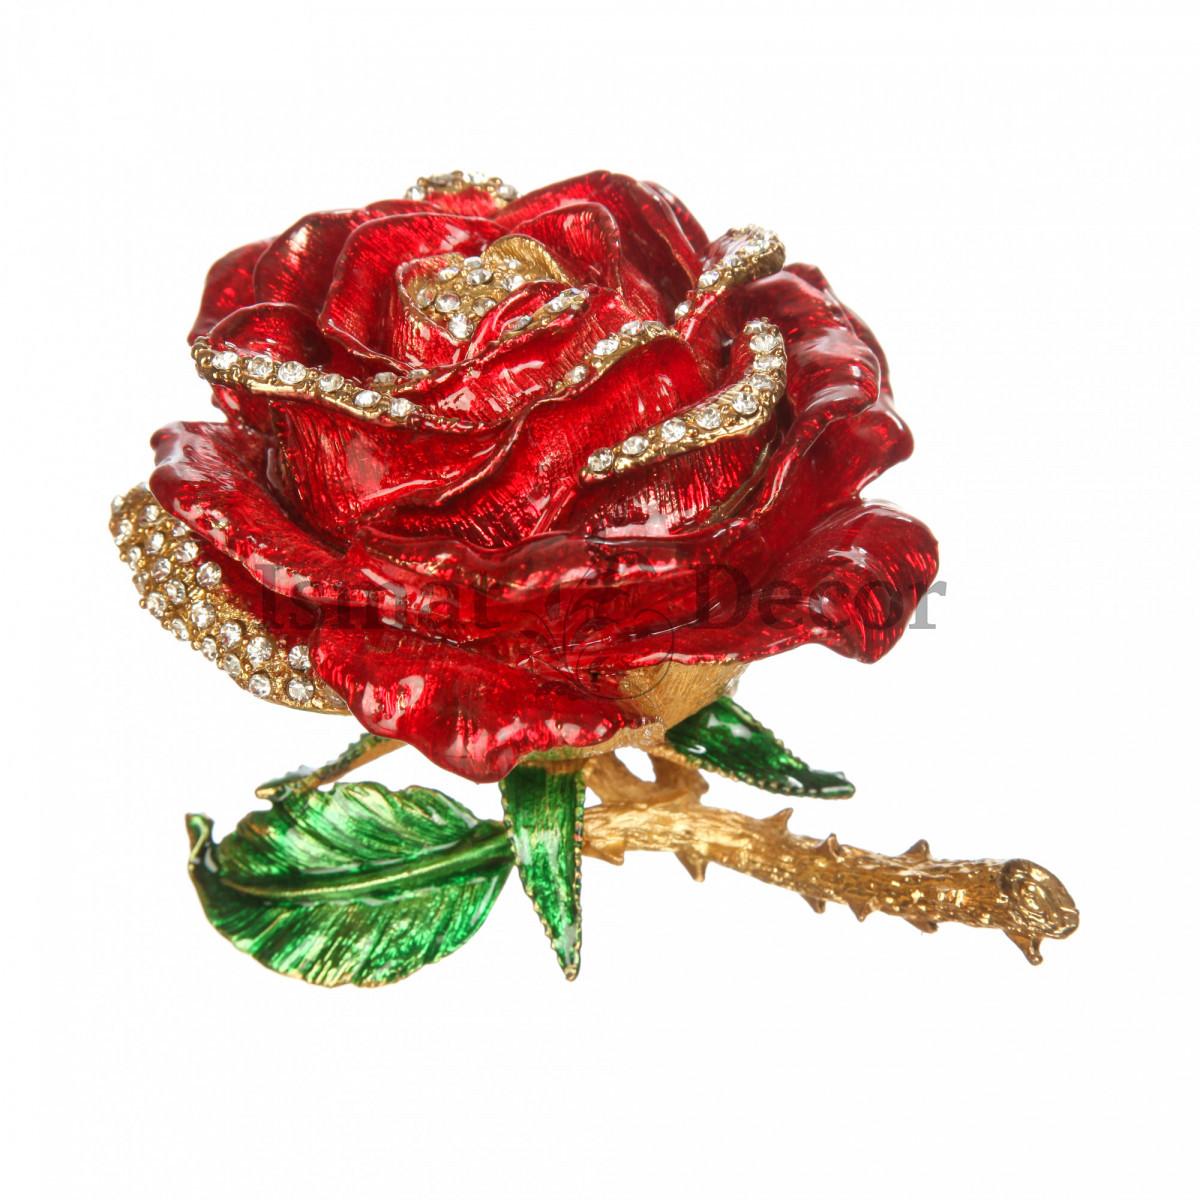 Шкатулка Большая роза